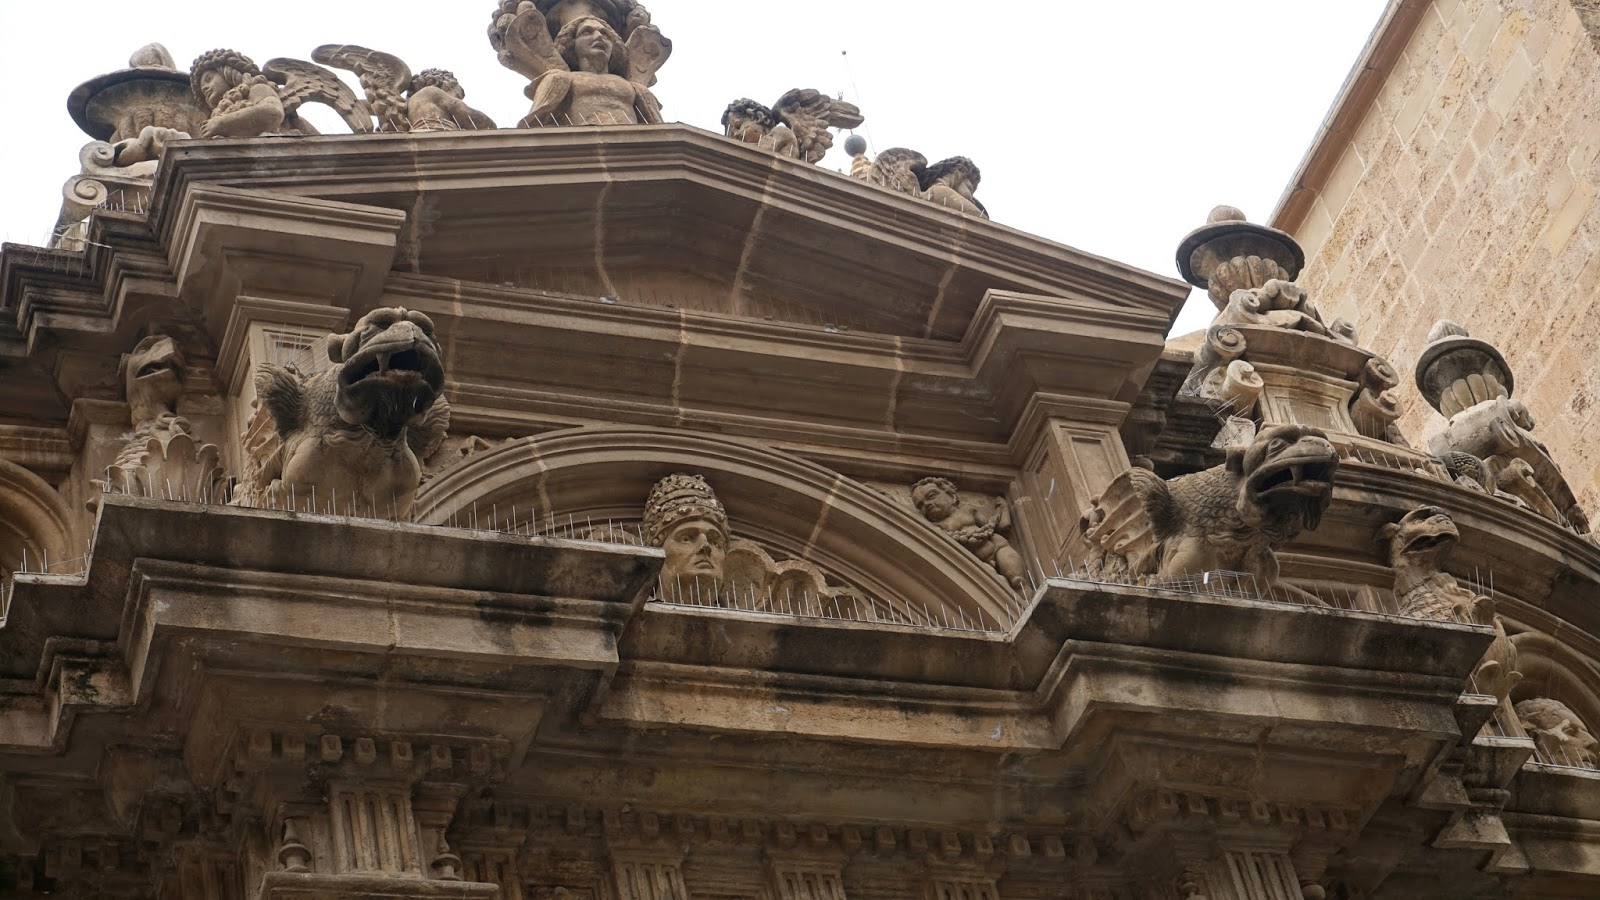 Murcja, Hiszpania, atrakcje południowej Hiszpanii, prowincja Murcja,  Costa Calida, Costa Blanca